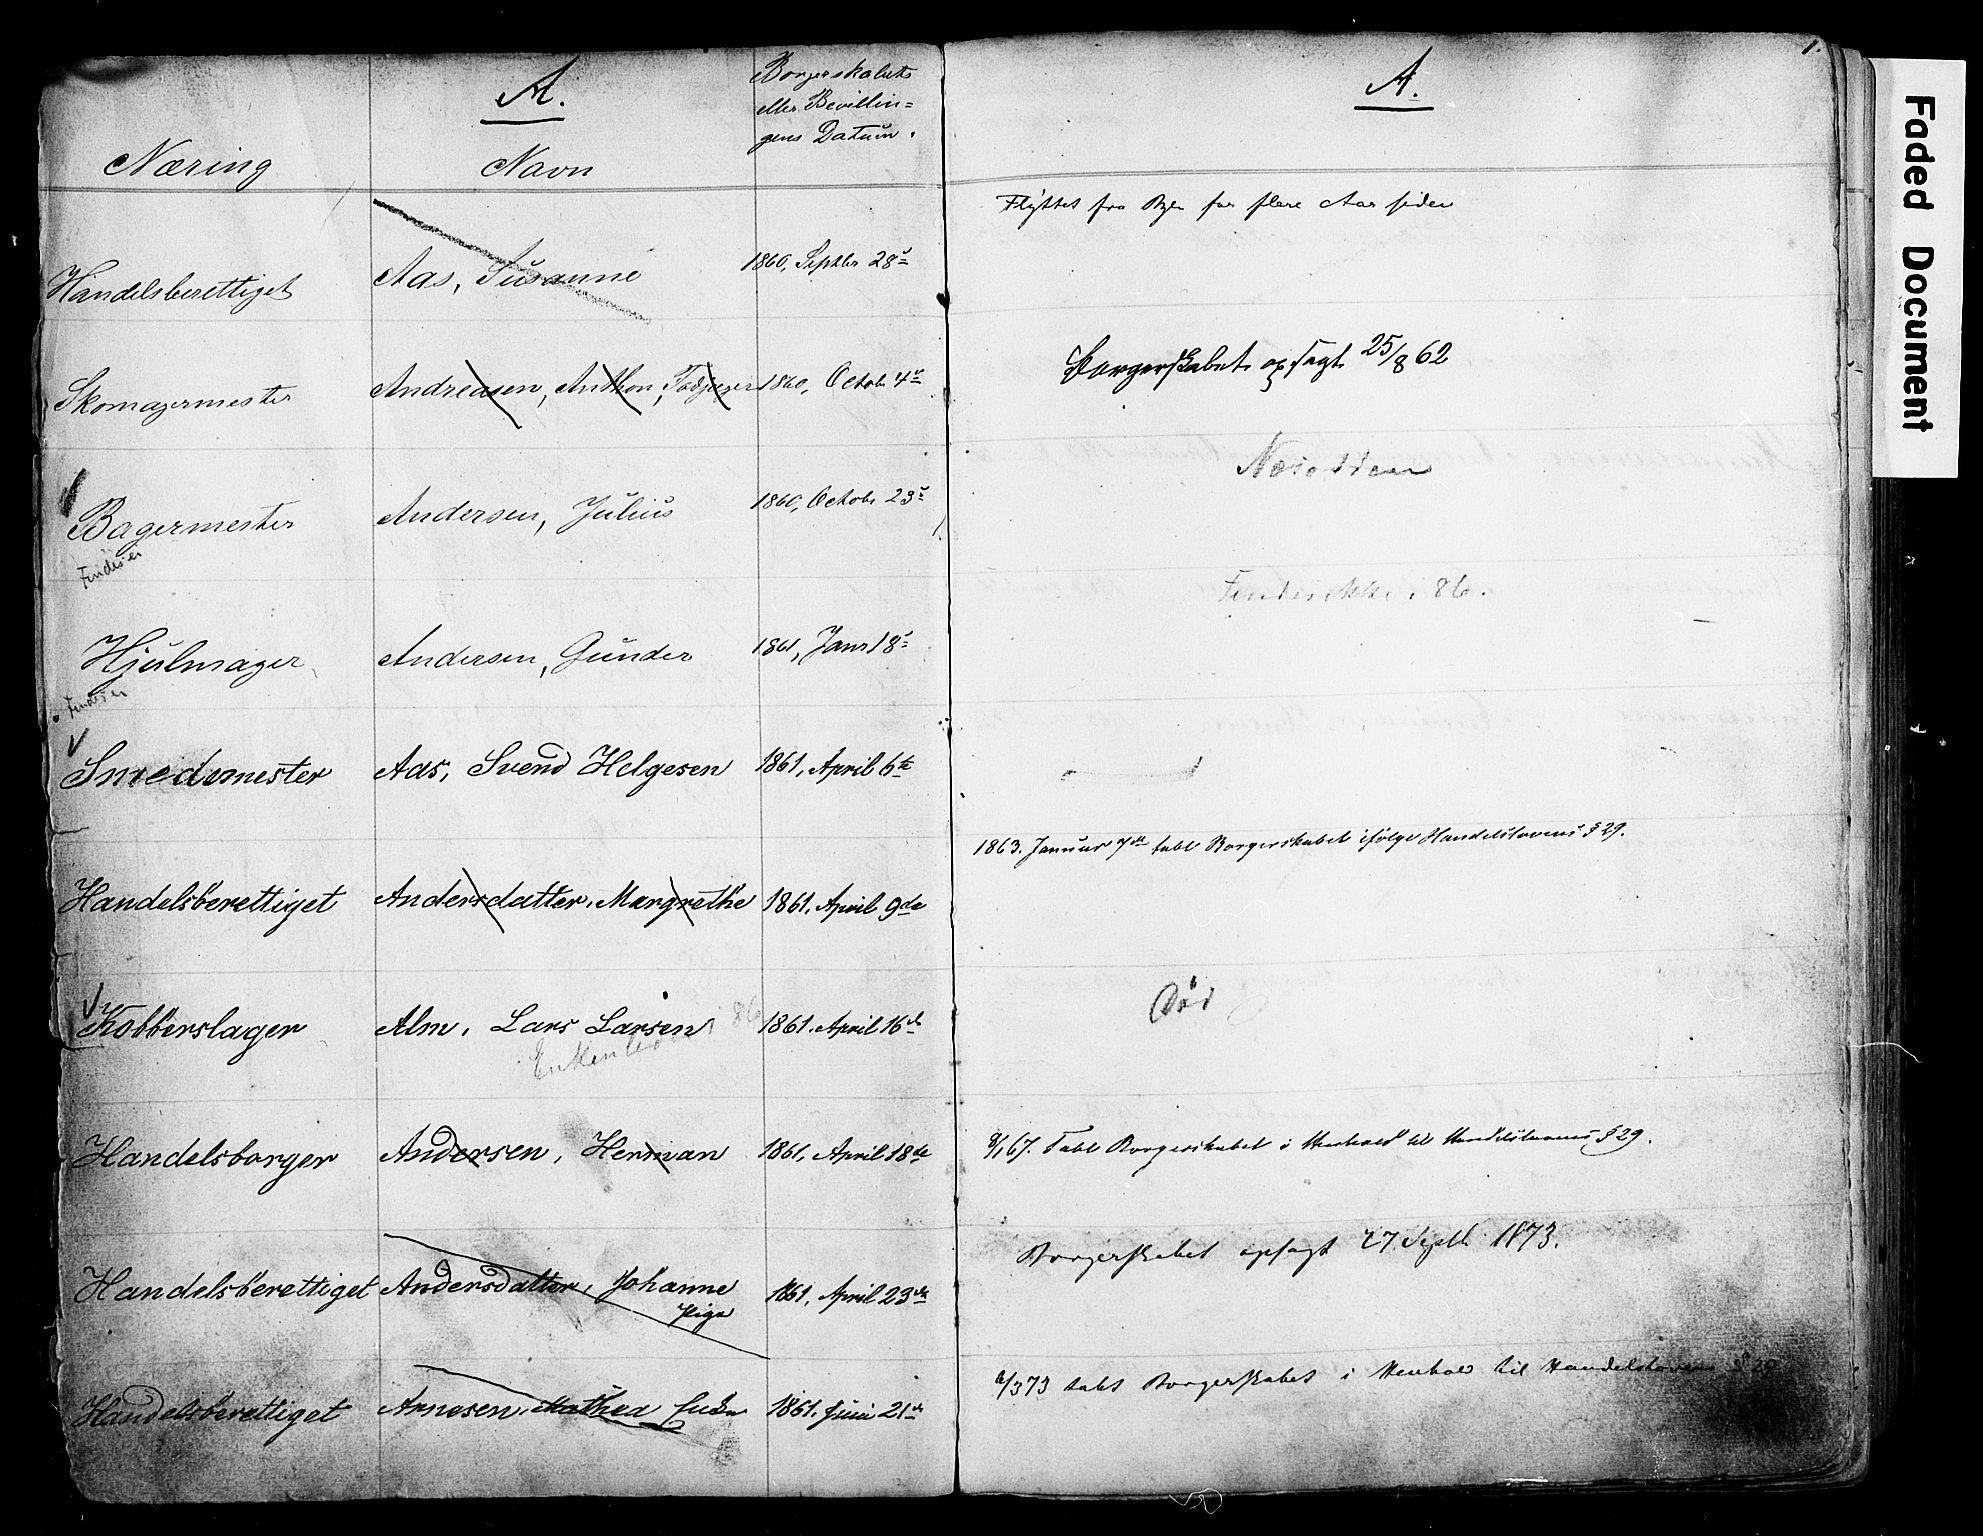 SAO, Kristiania magistrat, F/Fb/L0004: Borgerrulle, 1860-1879, s. 2